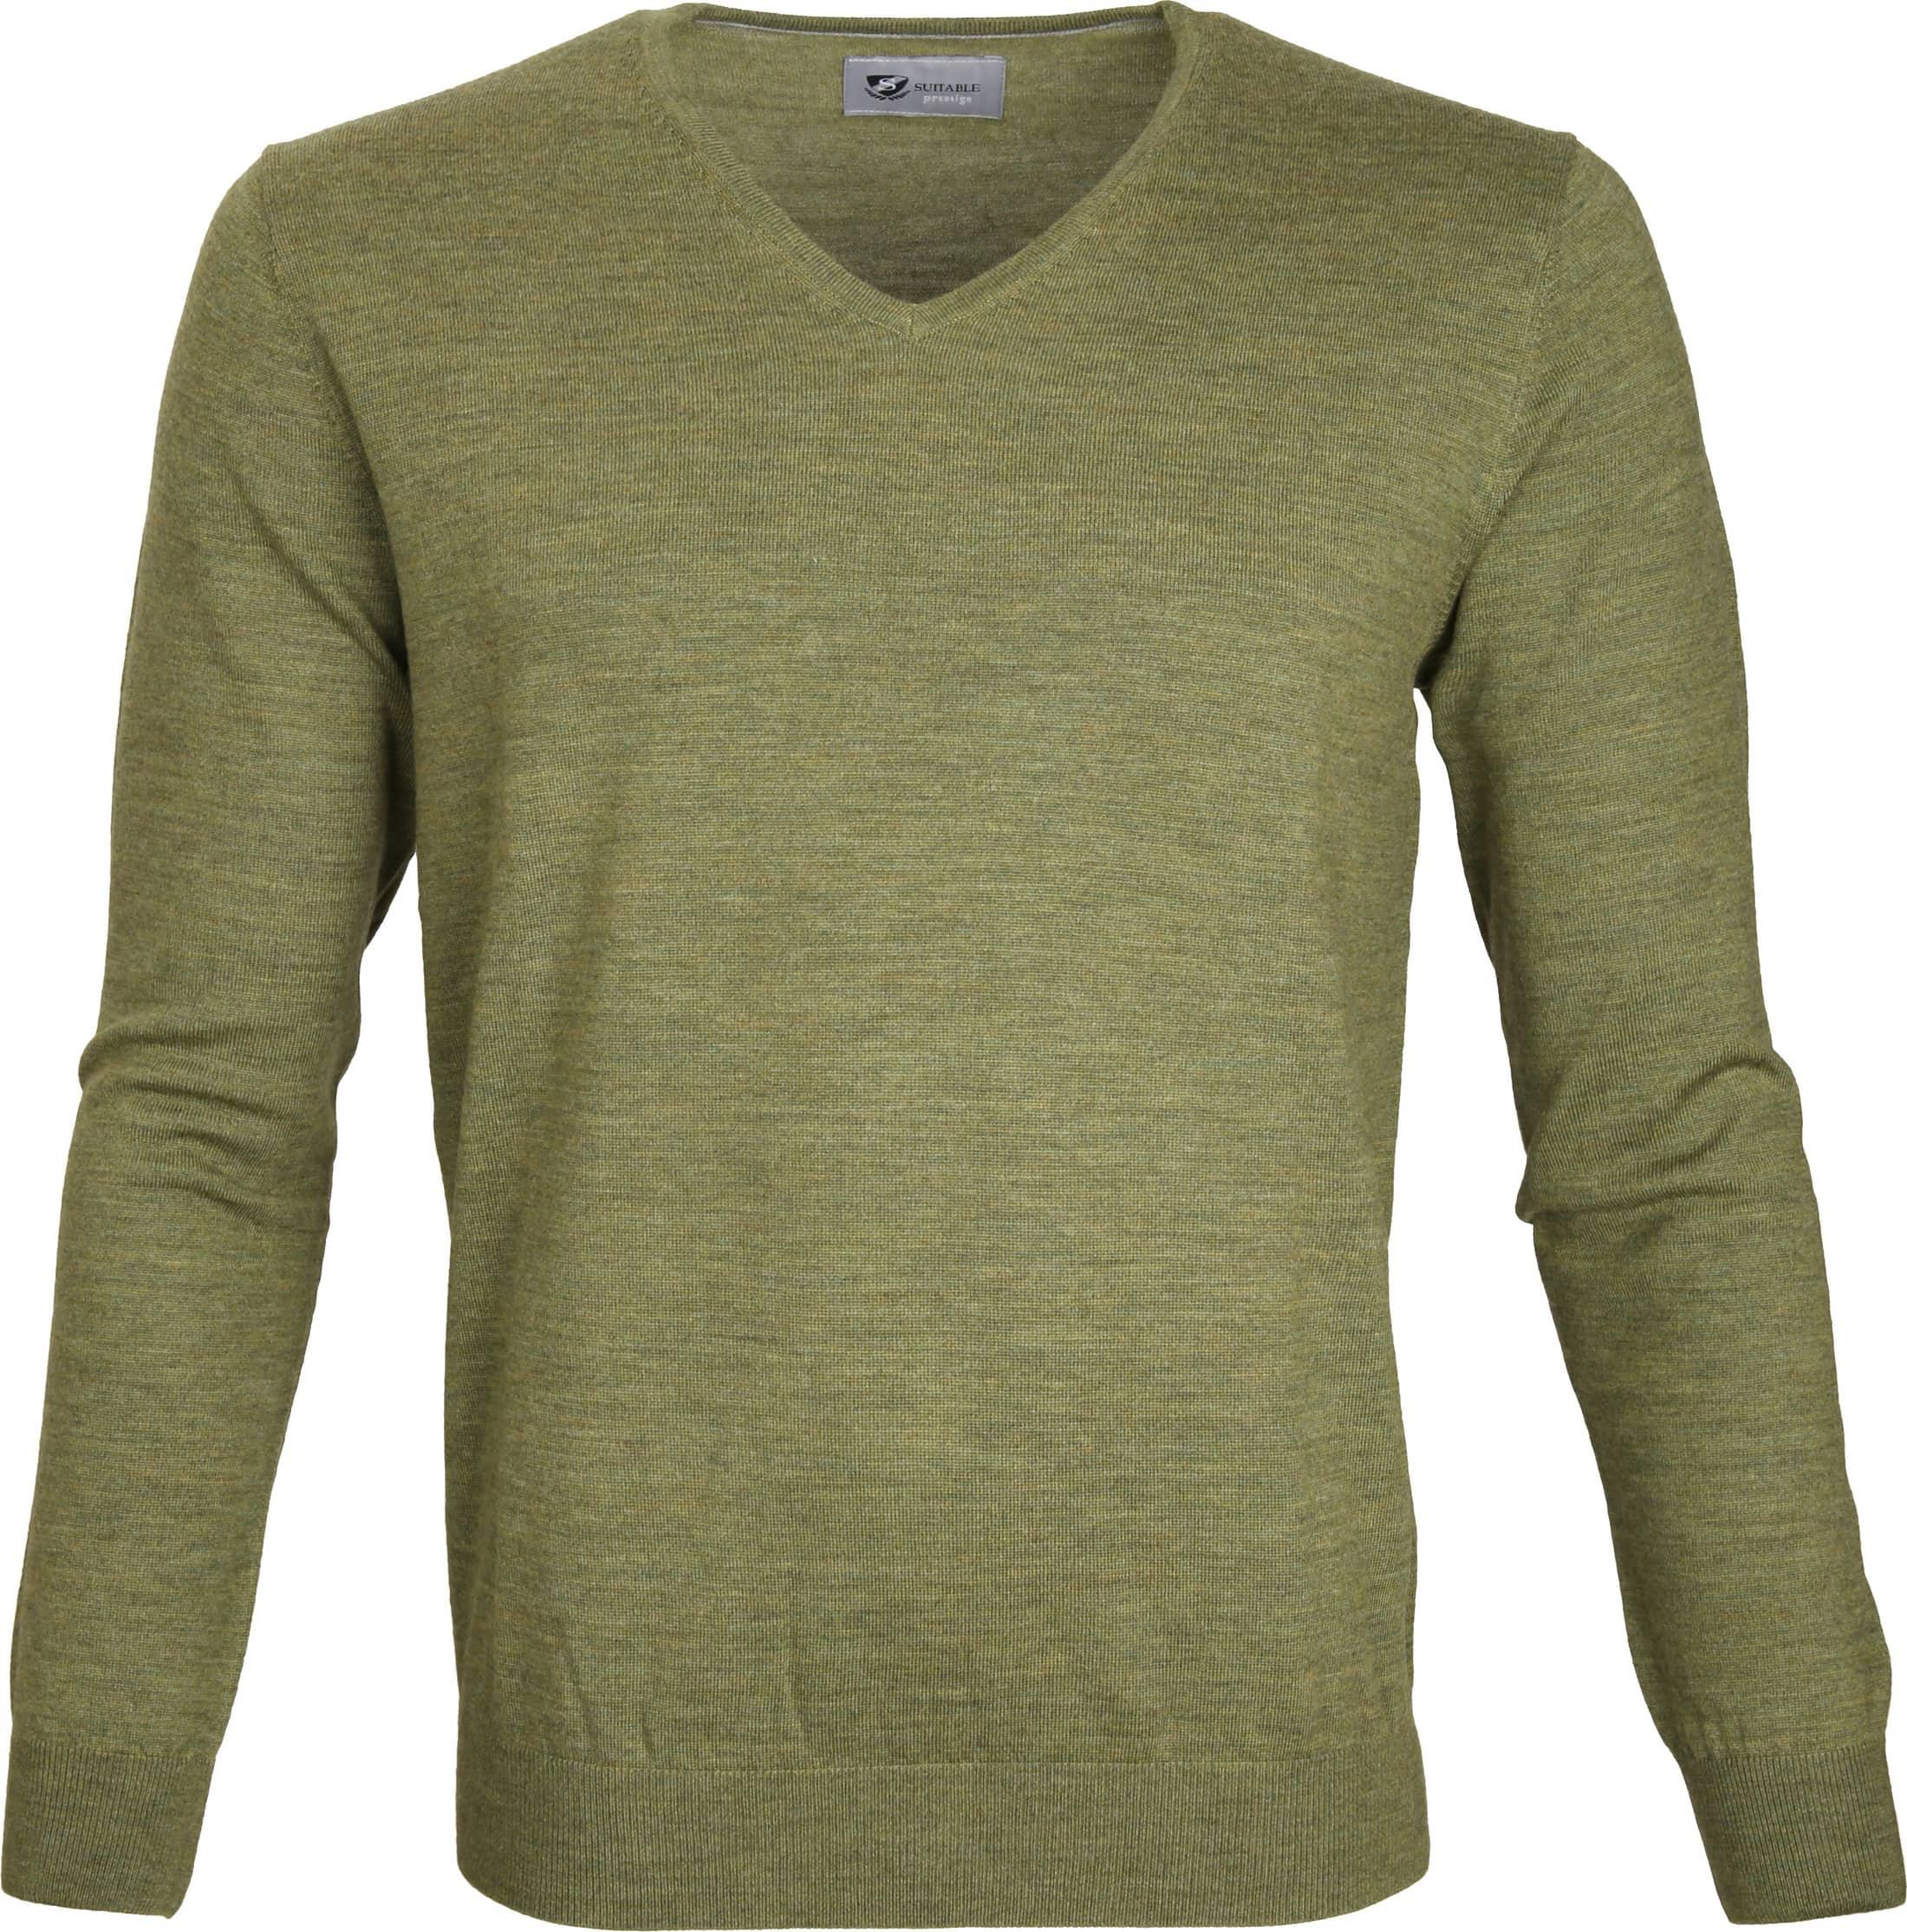 Suitable Prestige Pullover V-Ausschnitt Grün foto 0